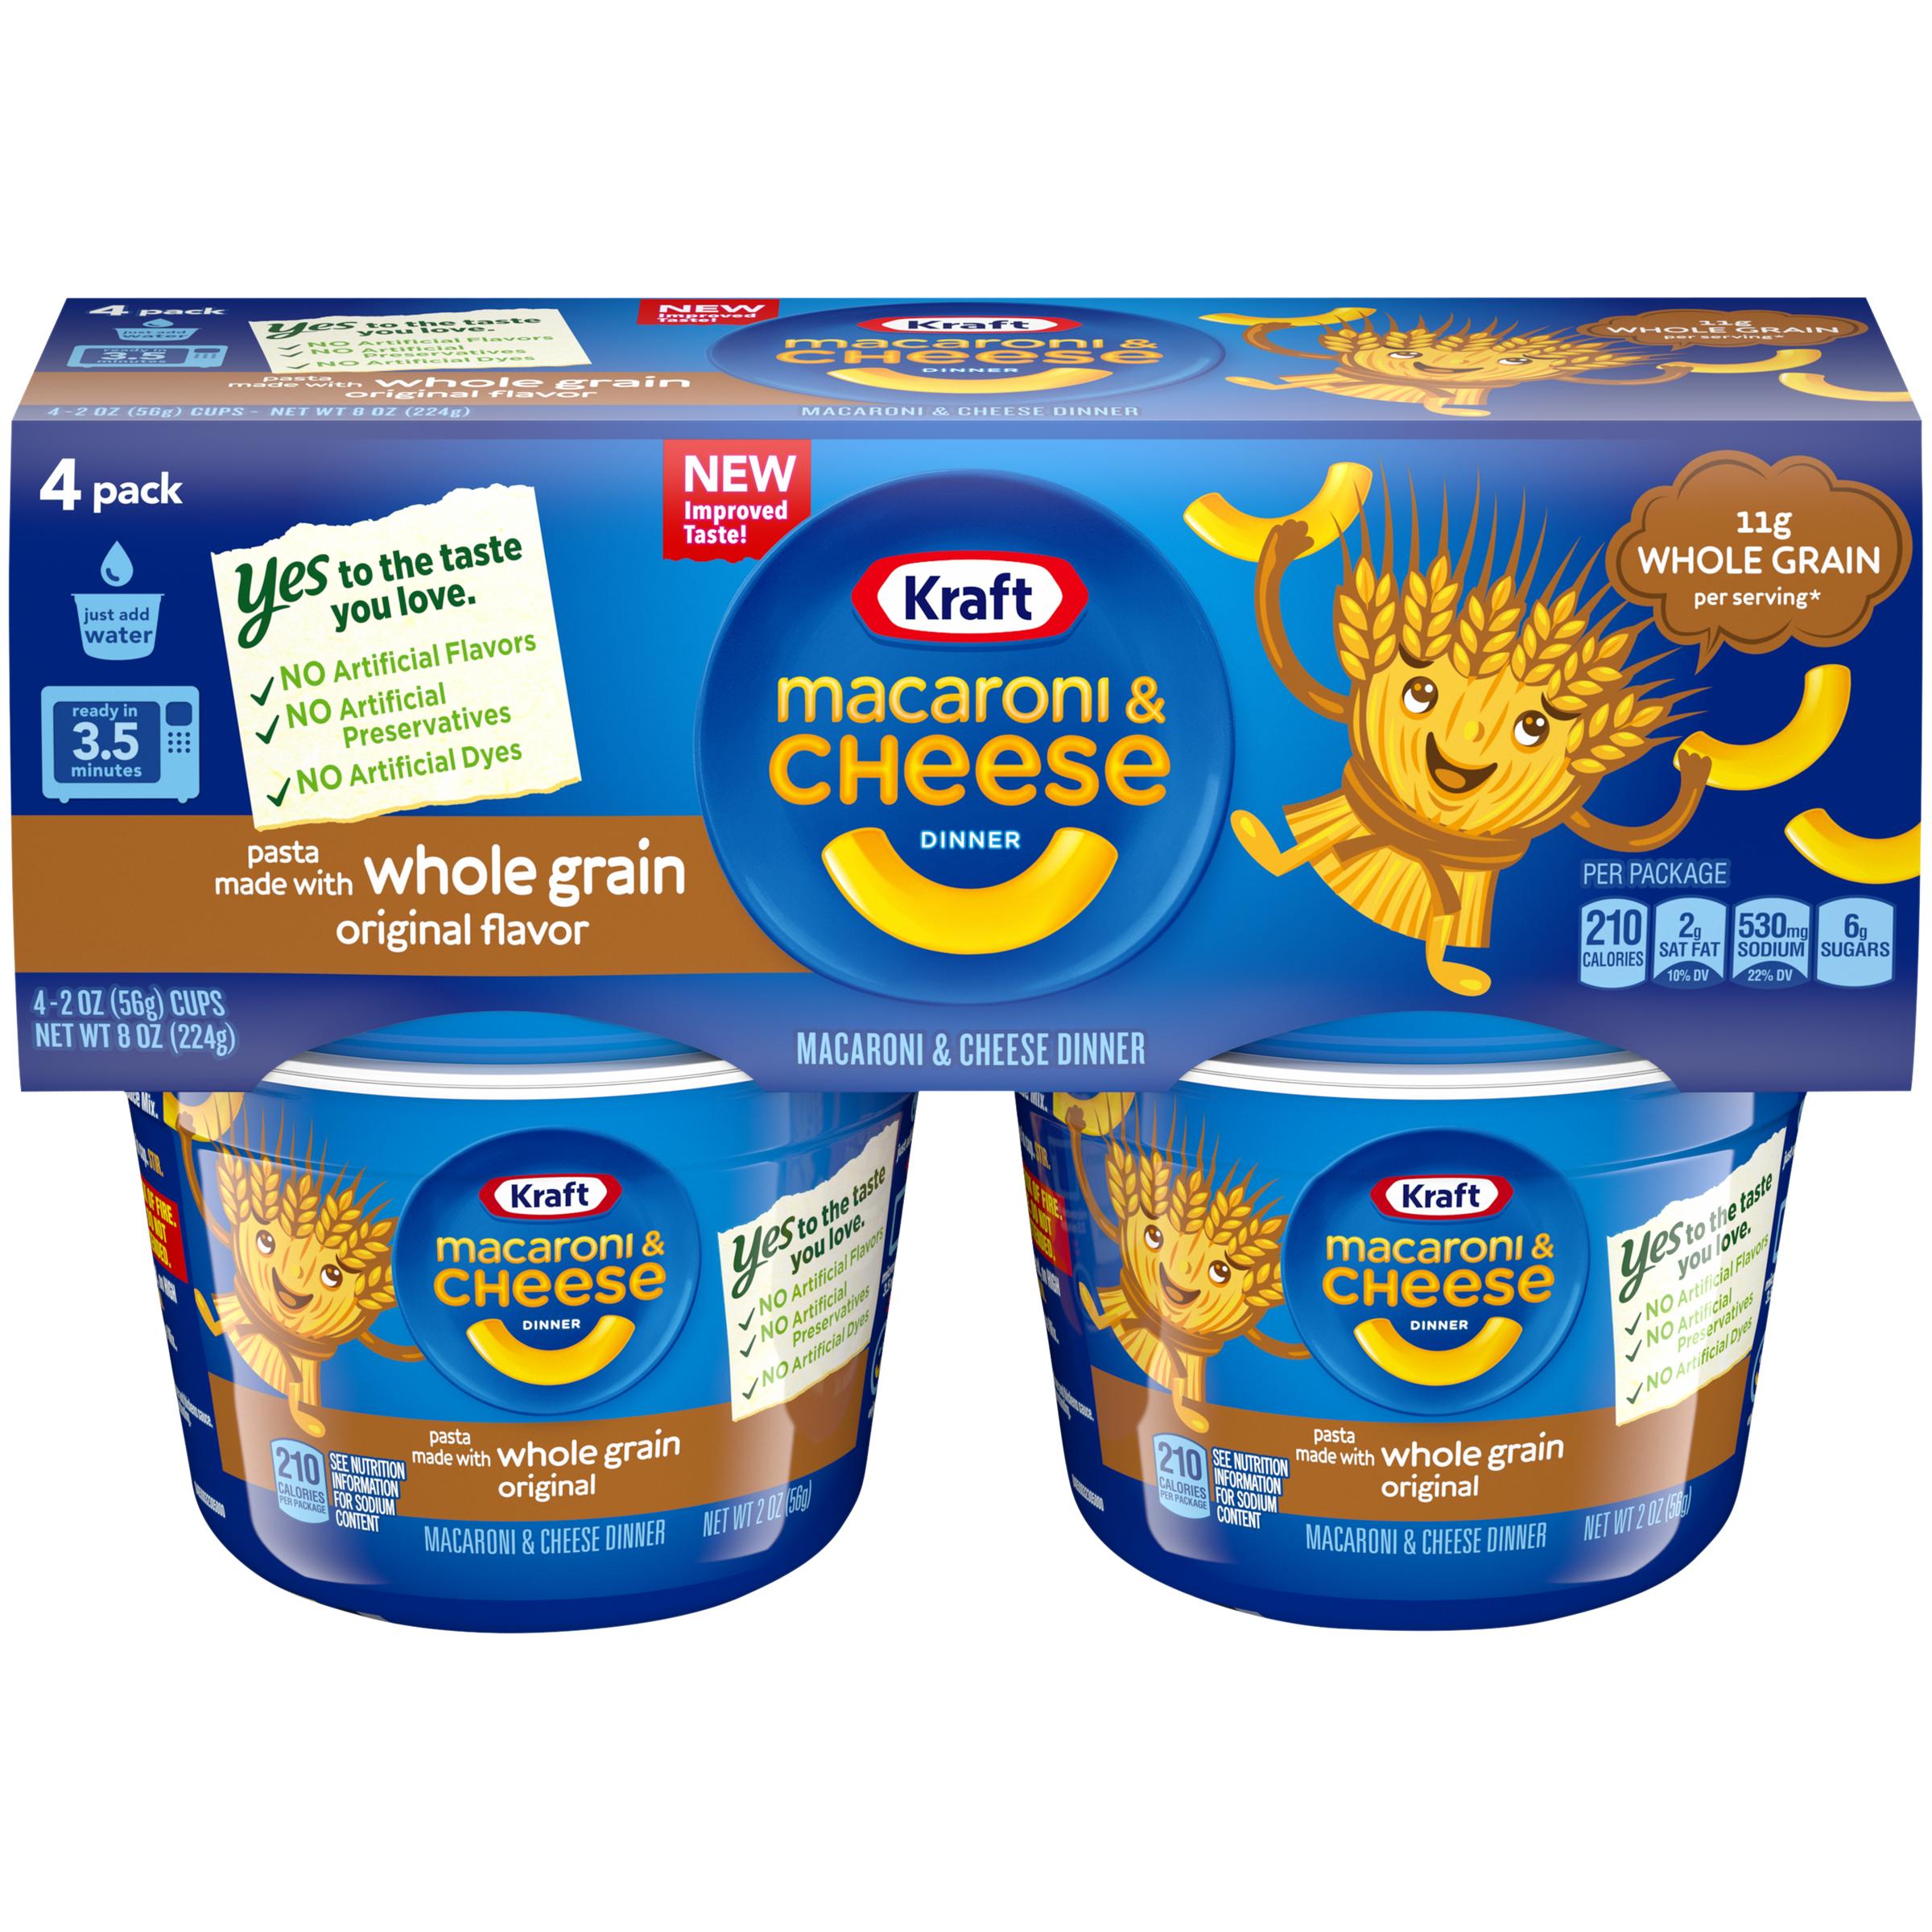 Kraft Easy Mac Whole Grain Original Flavor Macaroni & Cheese Dinner